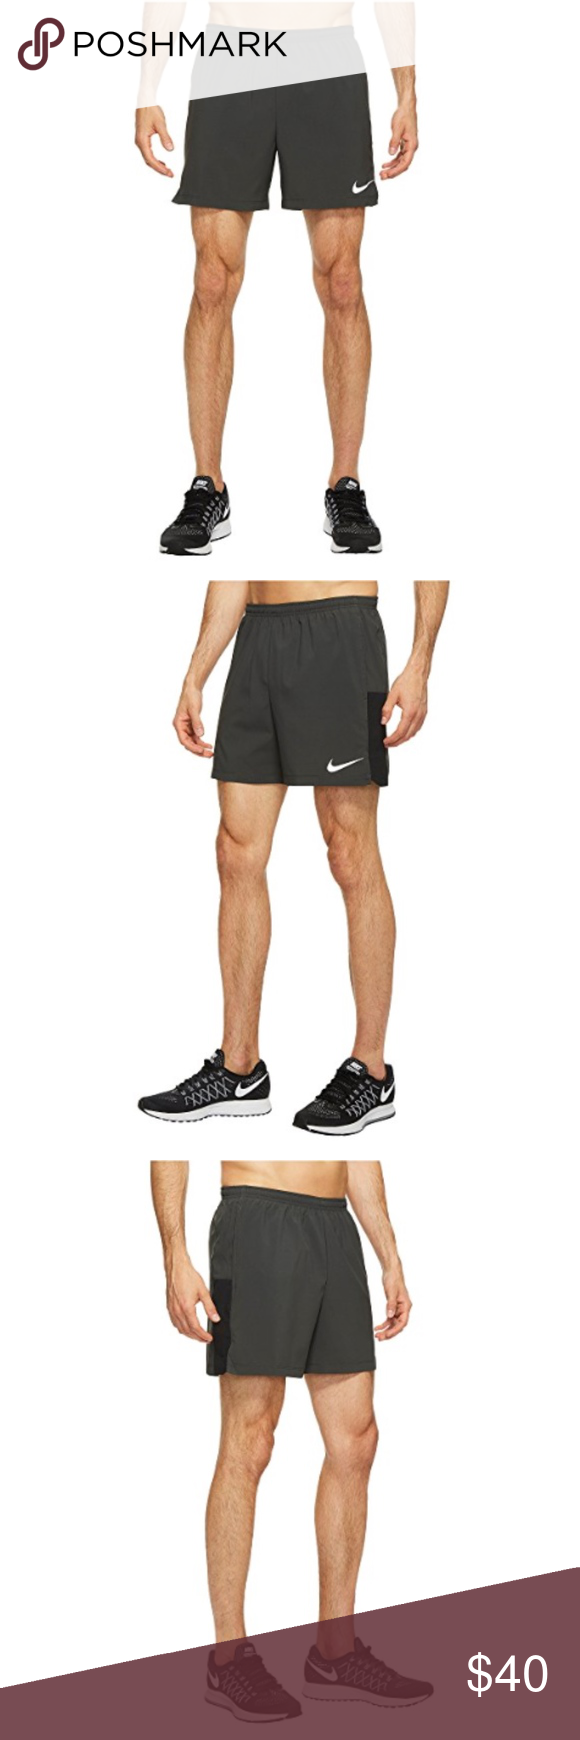 cda933c8e41b2 Nike Flex Challenger 5